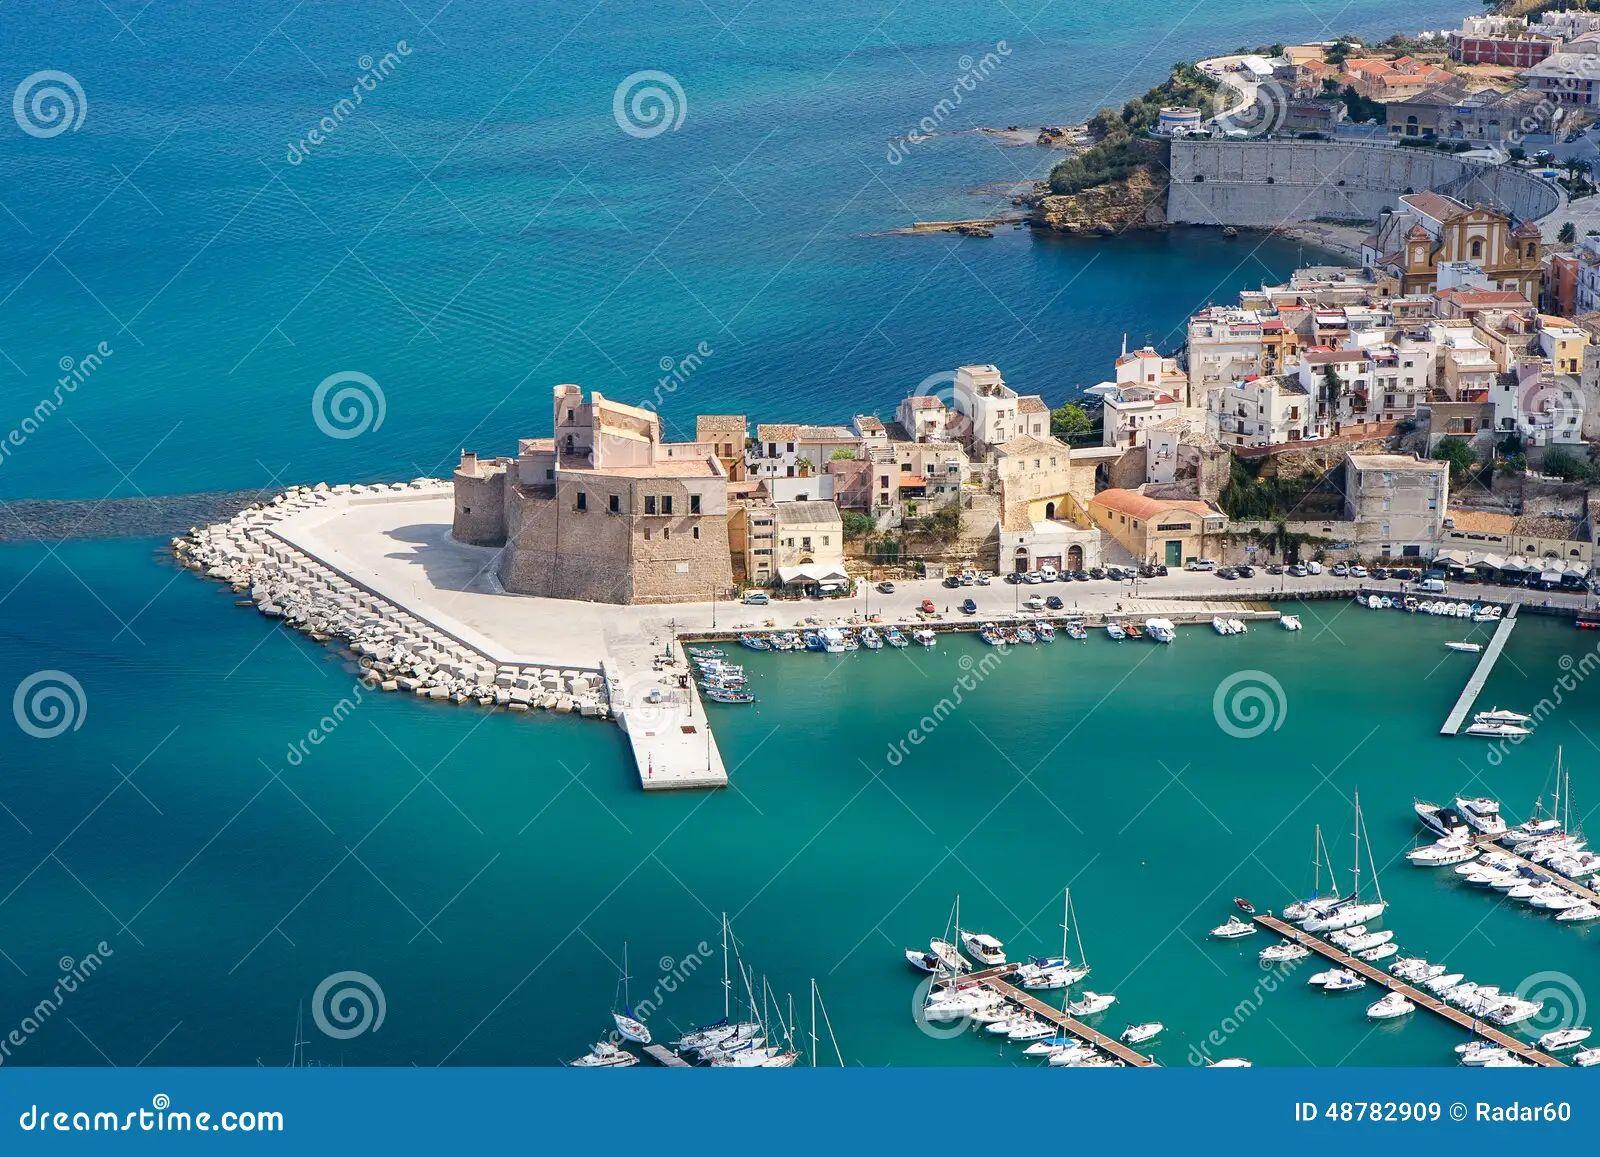 Castellammare del golfo harbor italy sea sicily